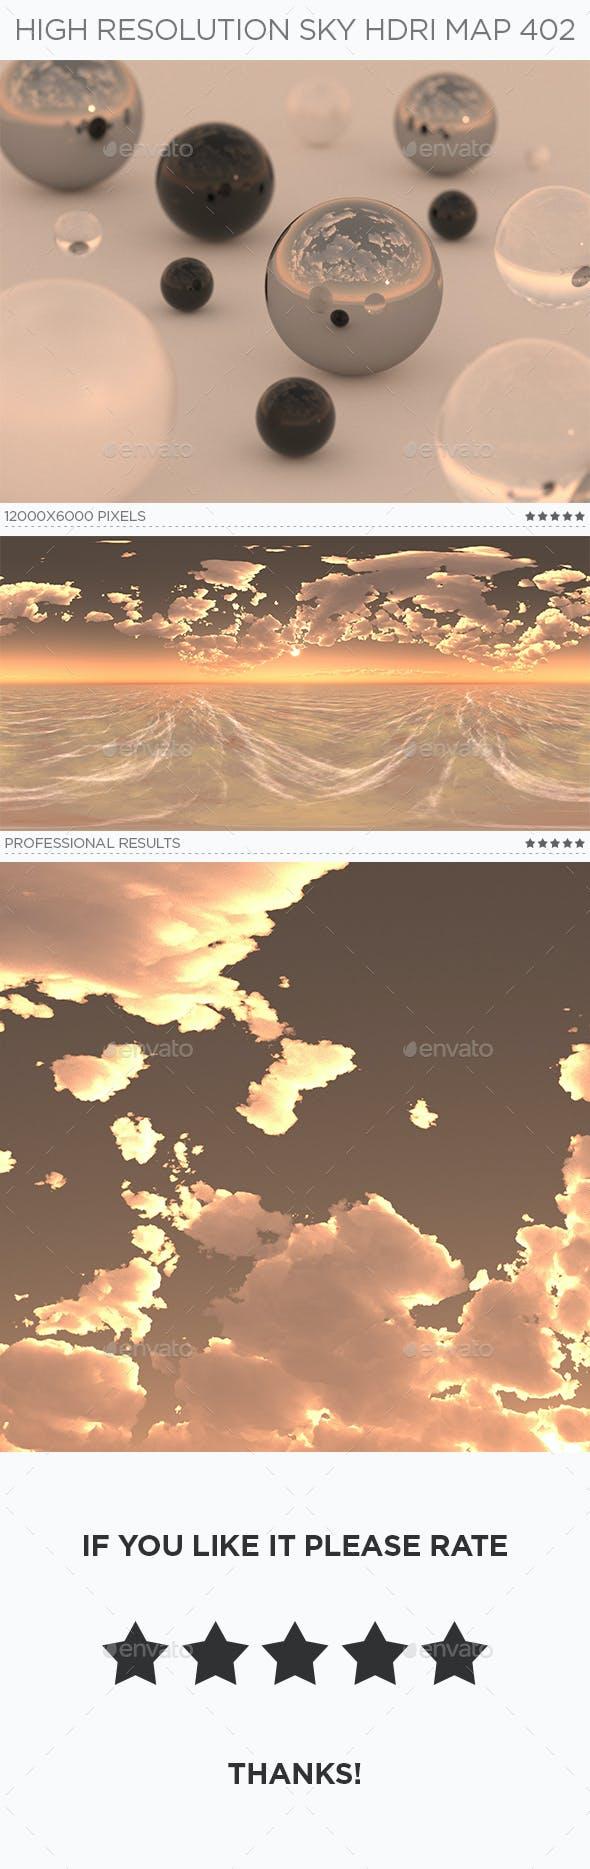 High Resolution Sky HDRi Map 402 - 3DOcean Item for Sale